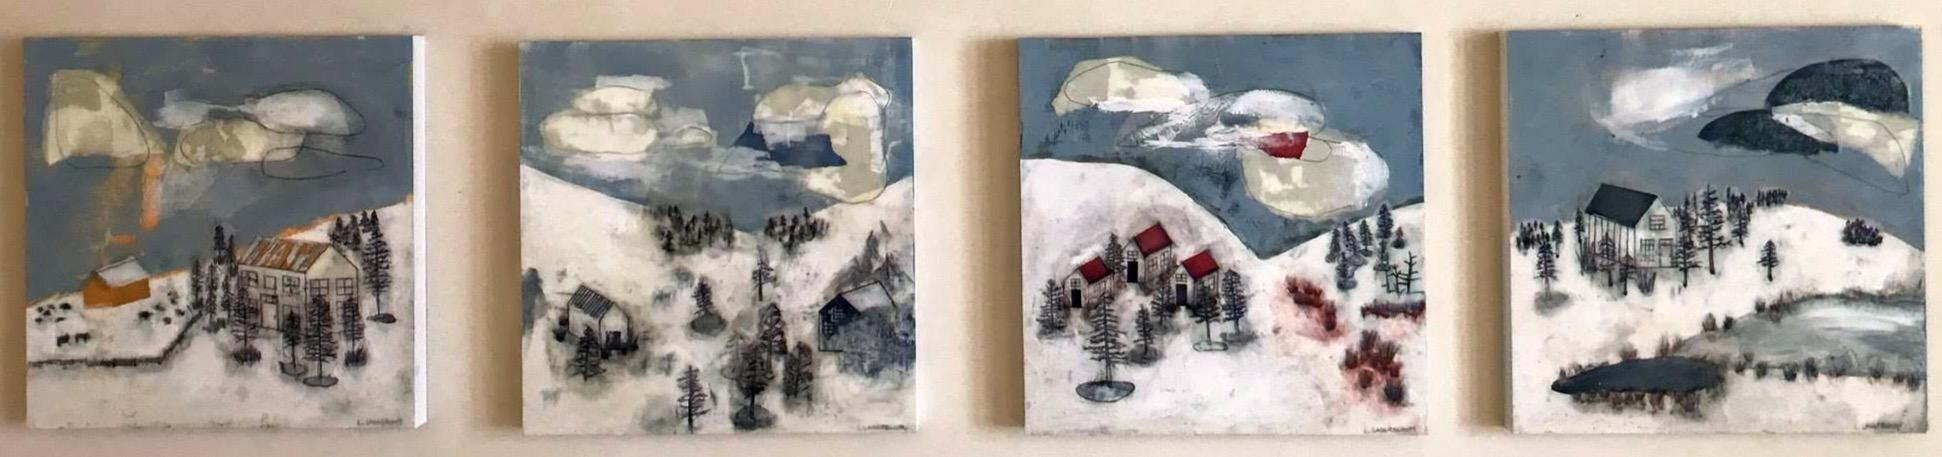 Winter Cabin Series